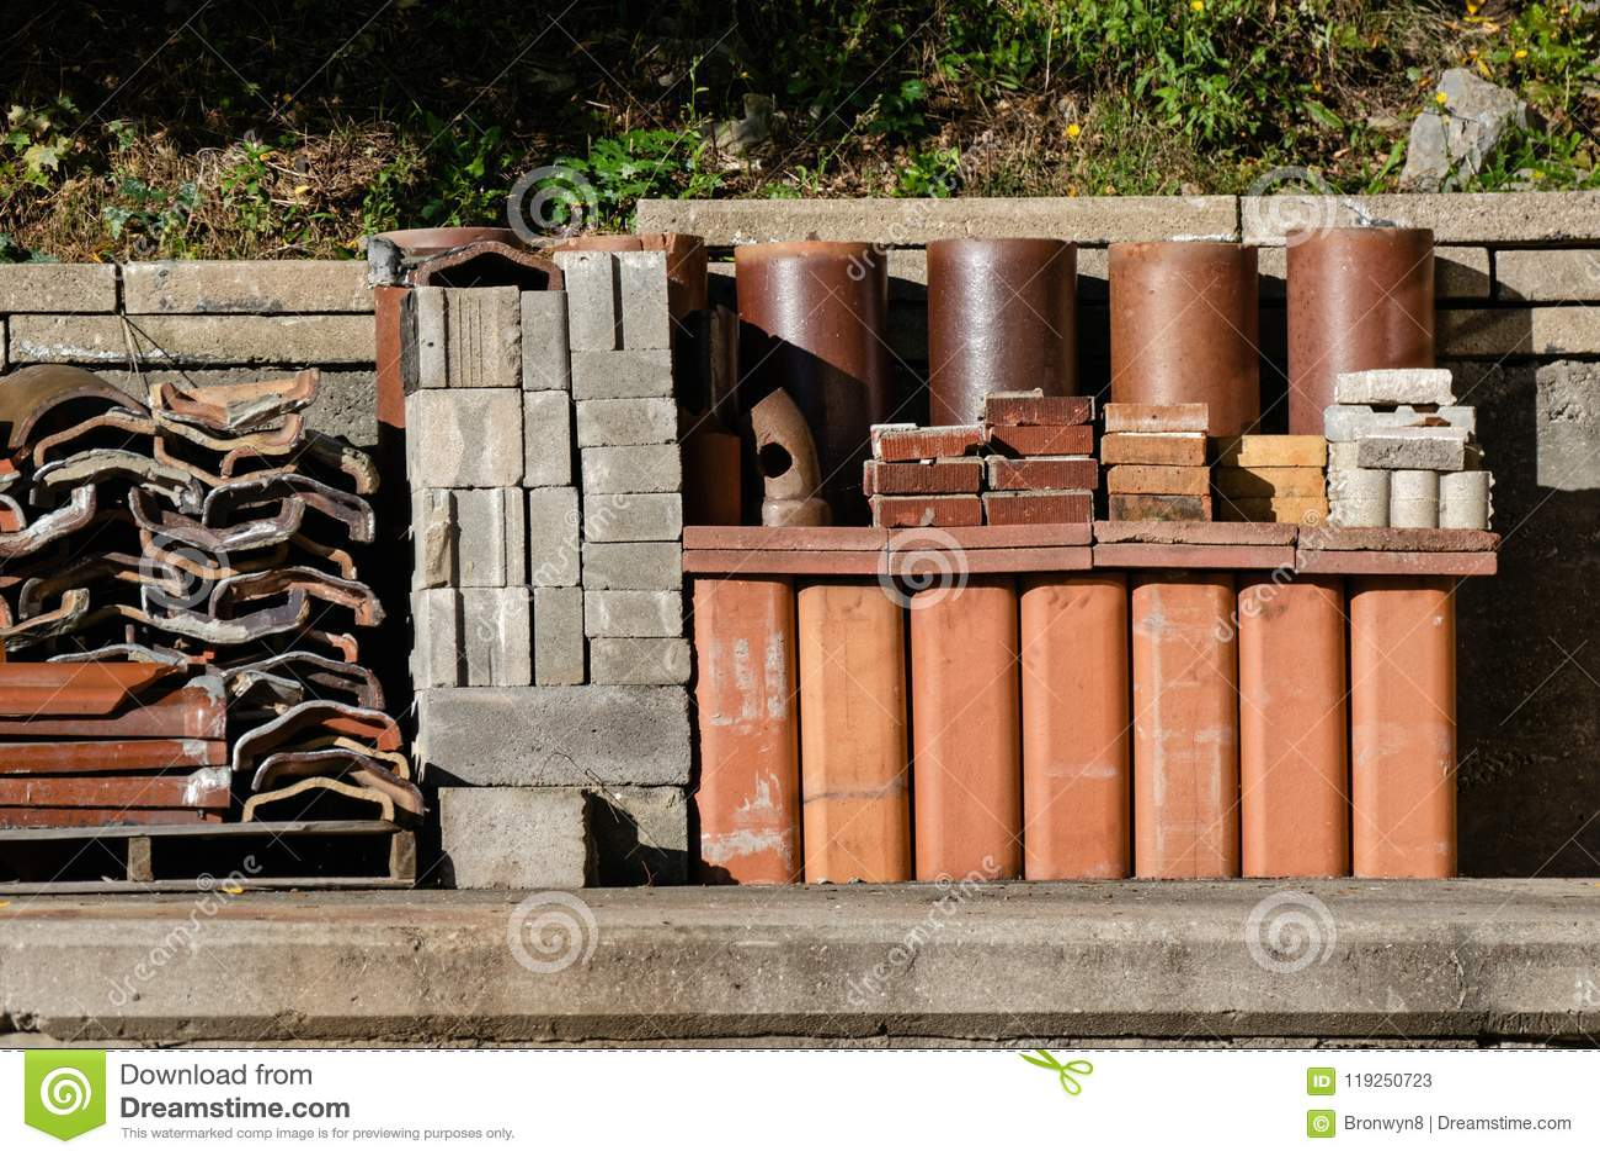 Ceramic And Blocks Scraps In Junkyard Stock Image Image Of - Ceramic tile scraps